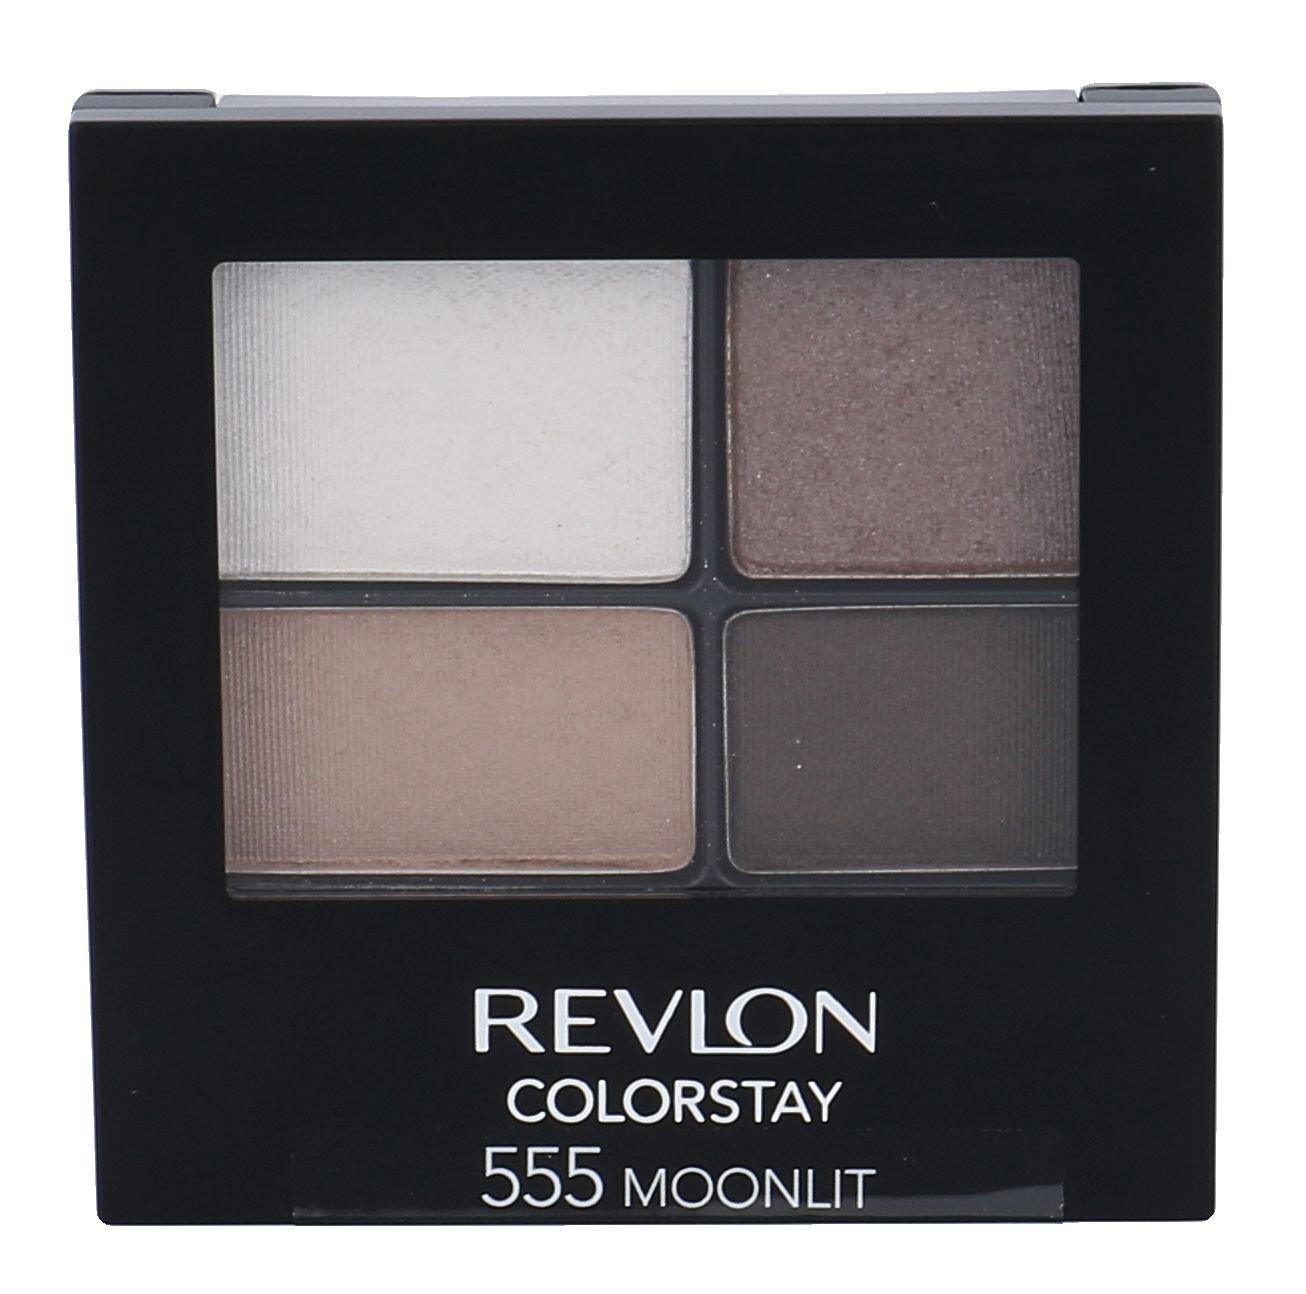 Revlon Colorstay Cosmetic 4,8ml 555 Moonlit